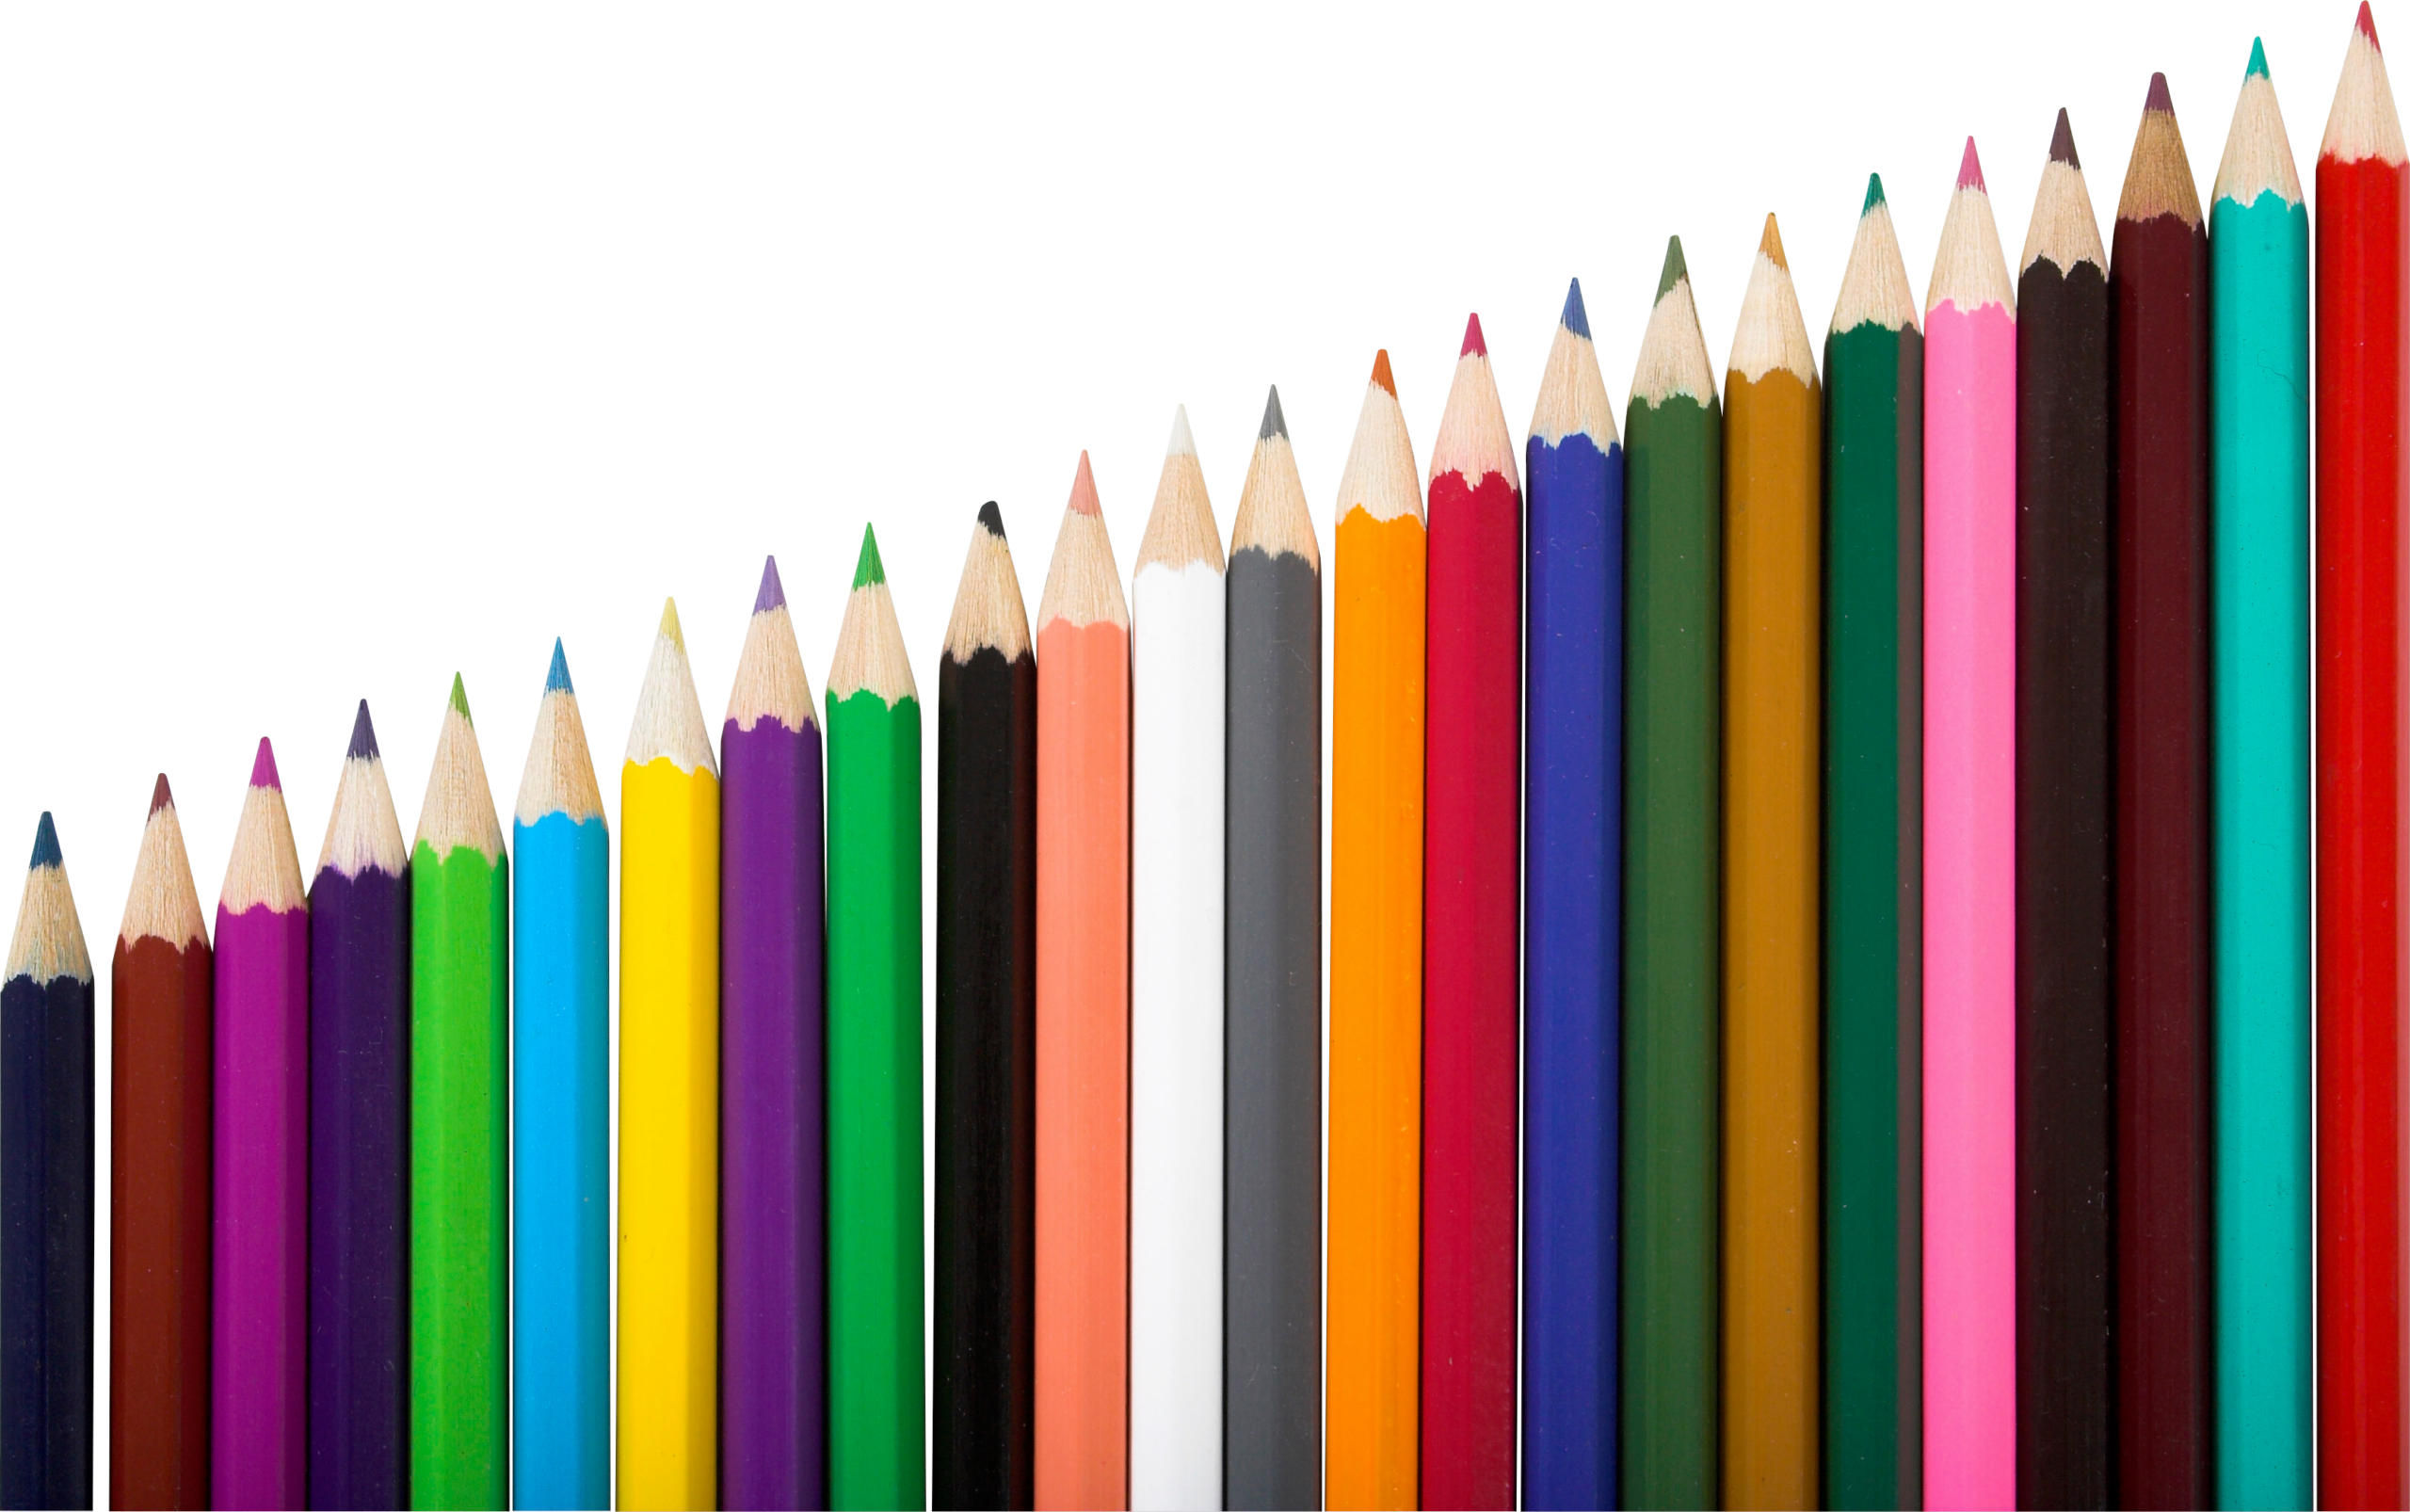 pencil illustrations wallpapers